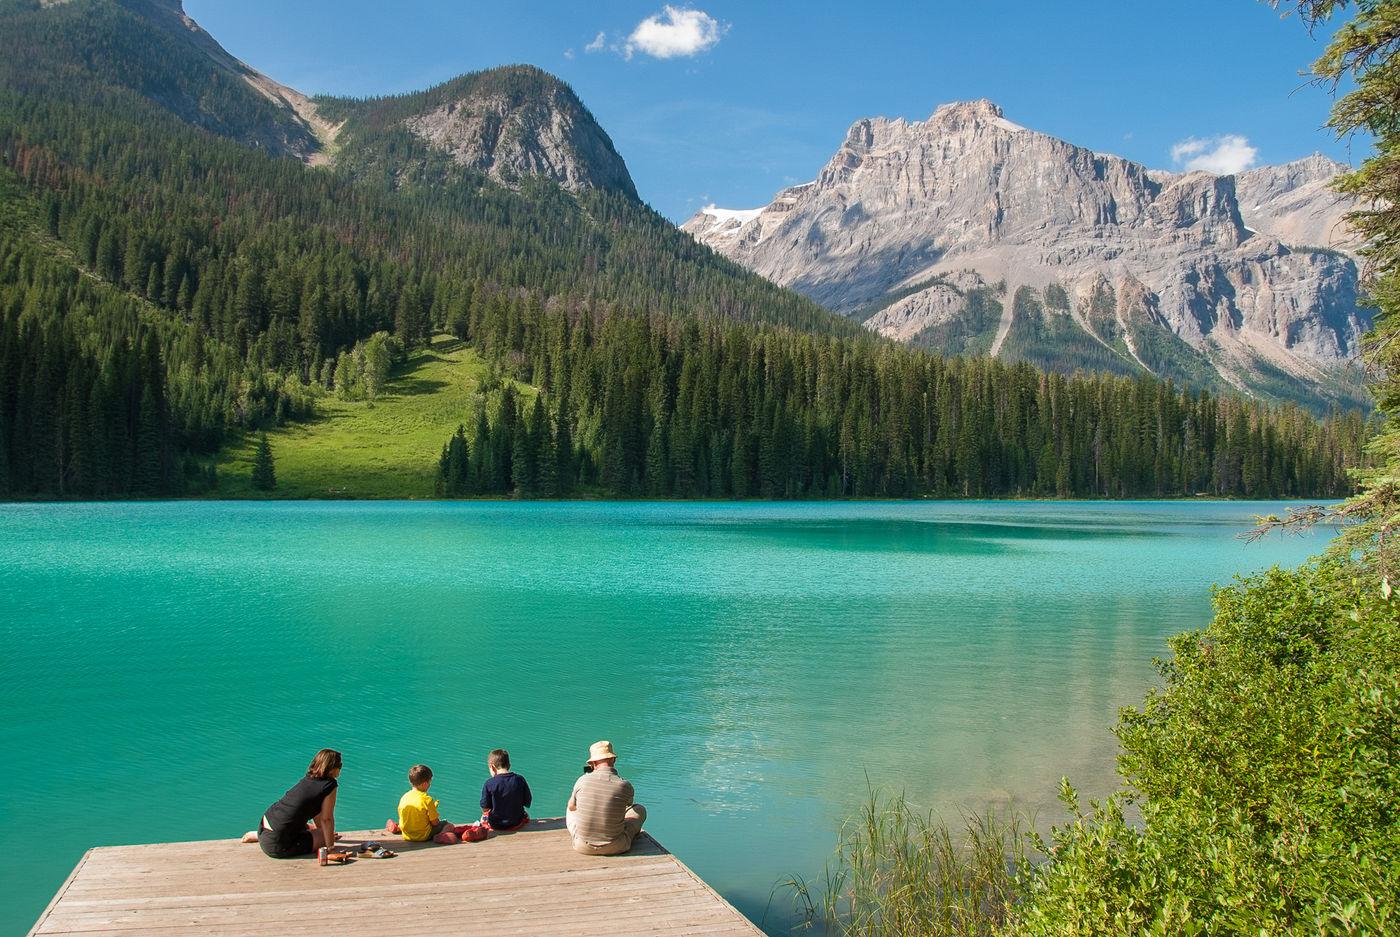 Emerald Lake, Canada. © Jeffrey Van Daele